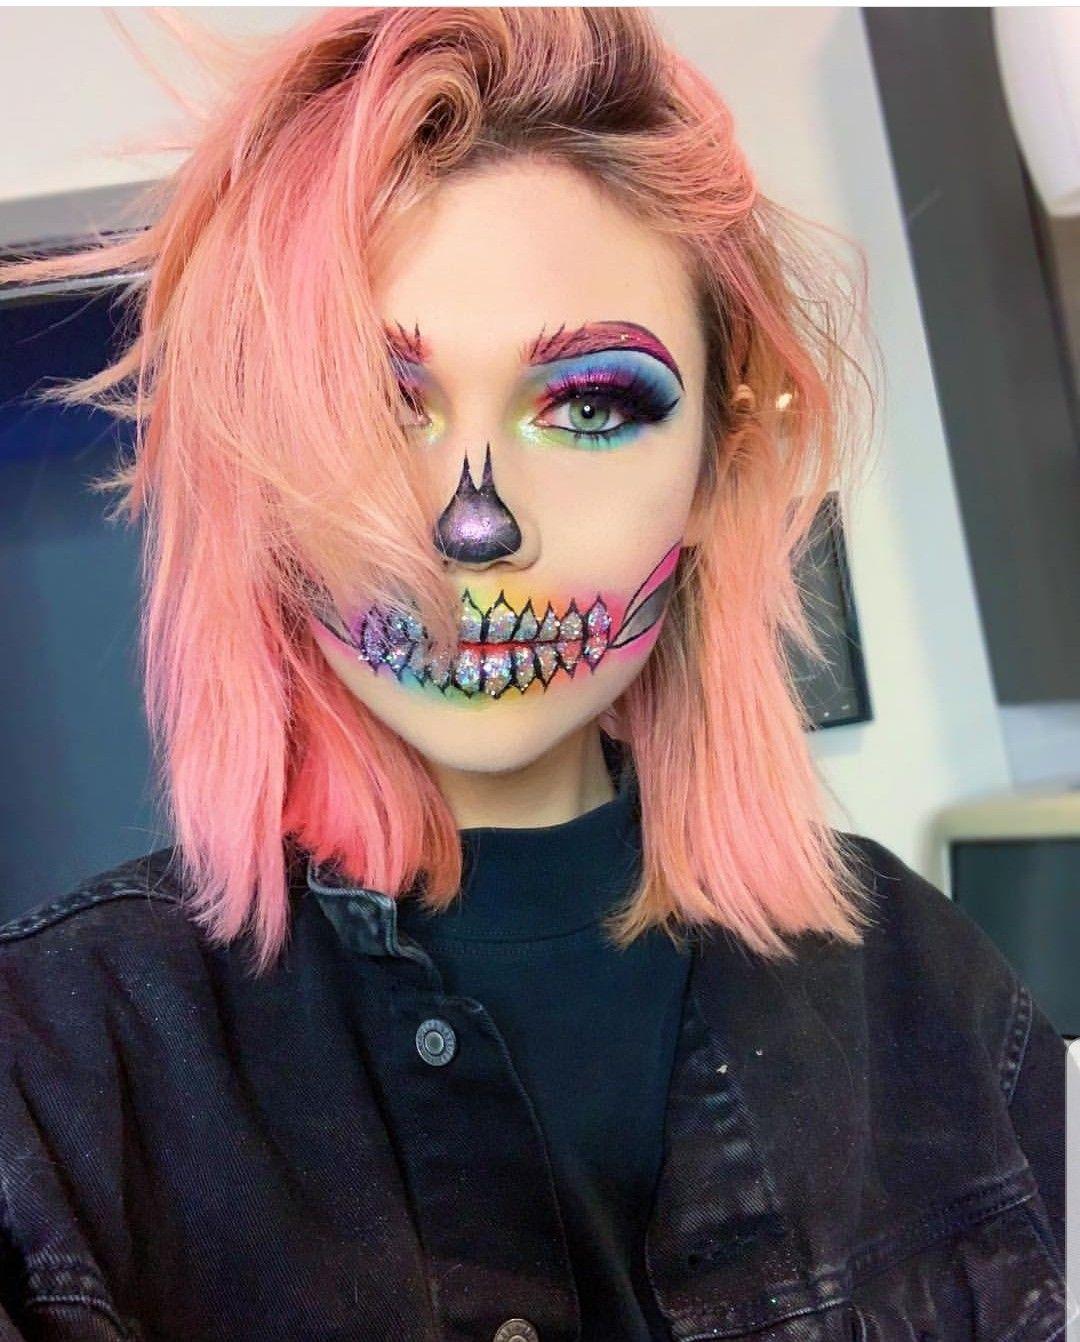 Pin by Kaylee Nicole on makeup looks Cool halloween